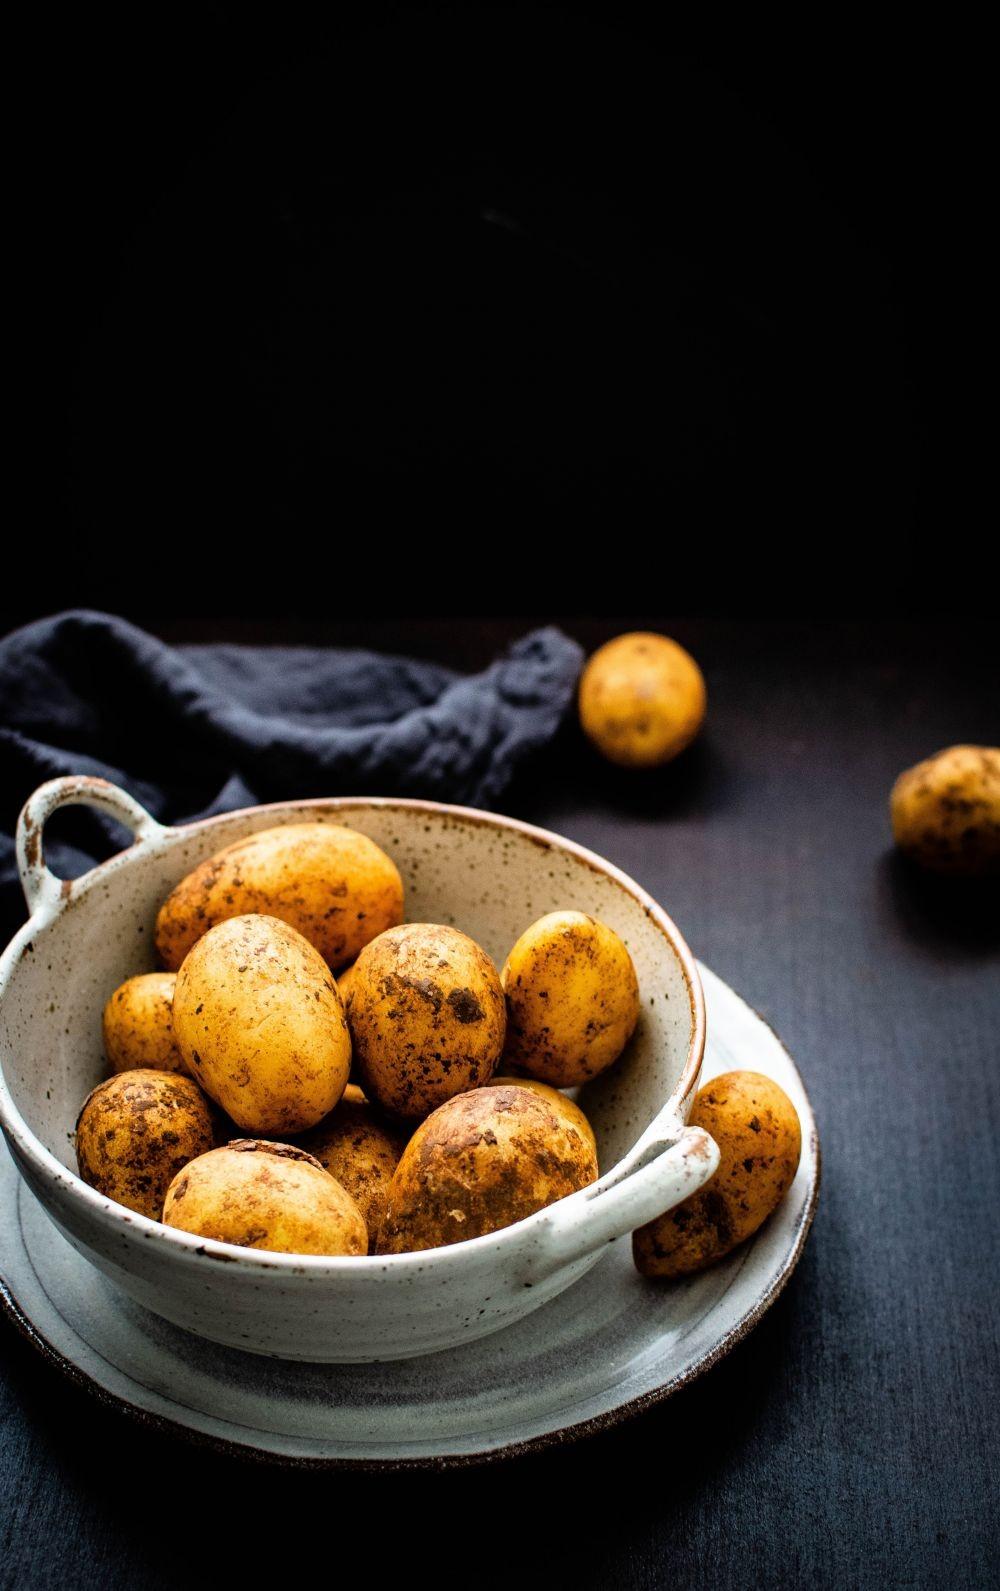 Resep Pommes Anna, Hidangan Klasik Prancis yang Lezat dan Sederhana